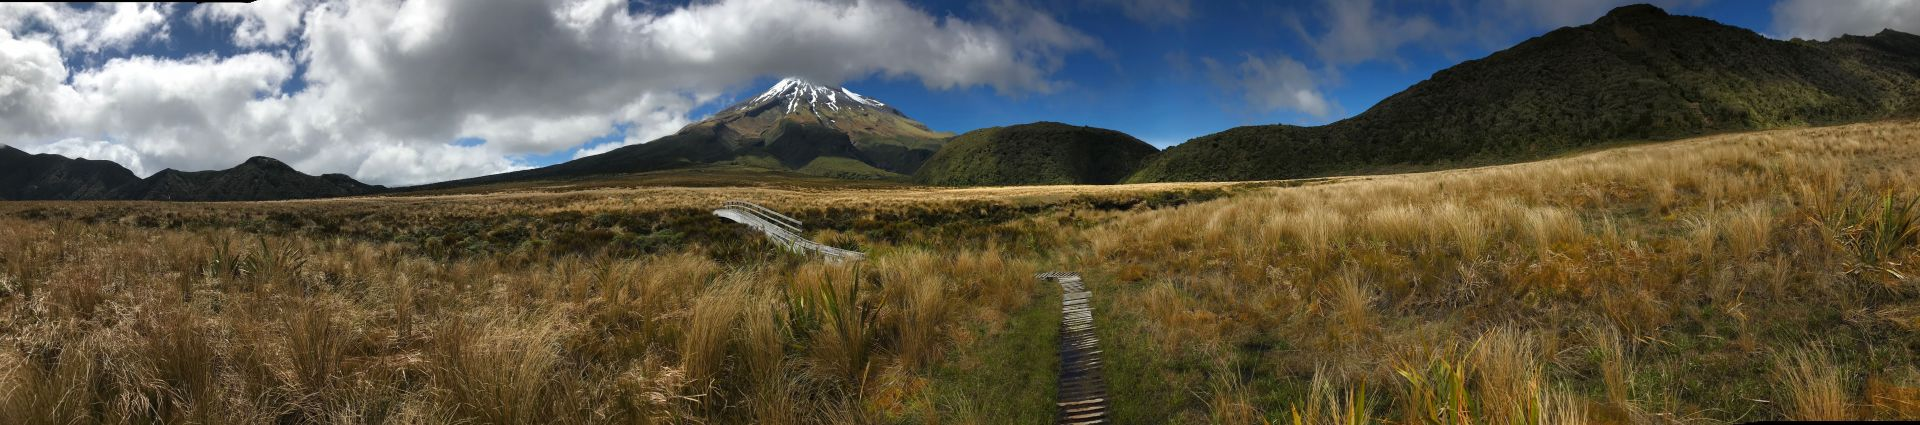 Hiking and Nature